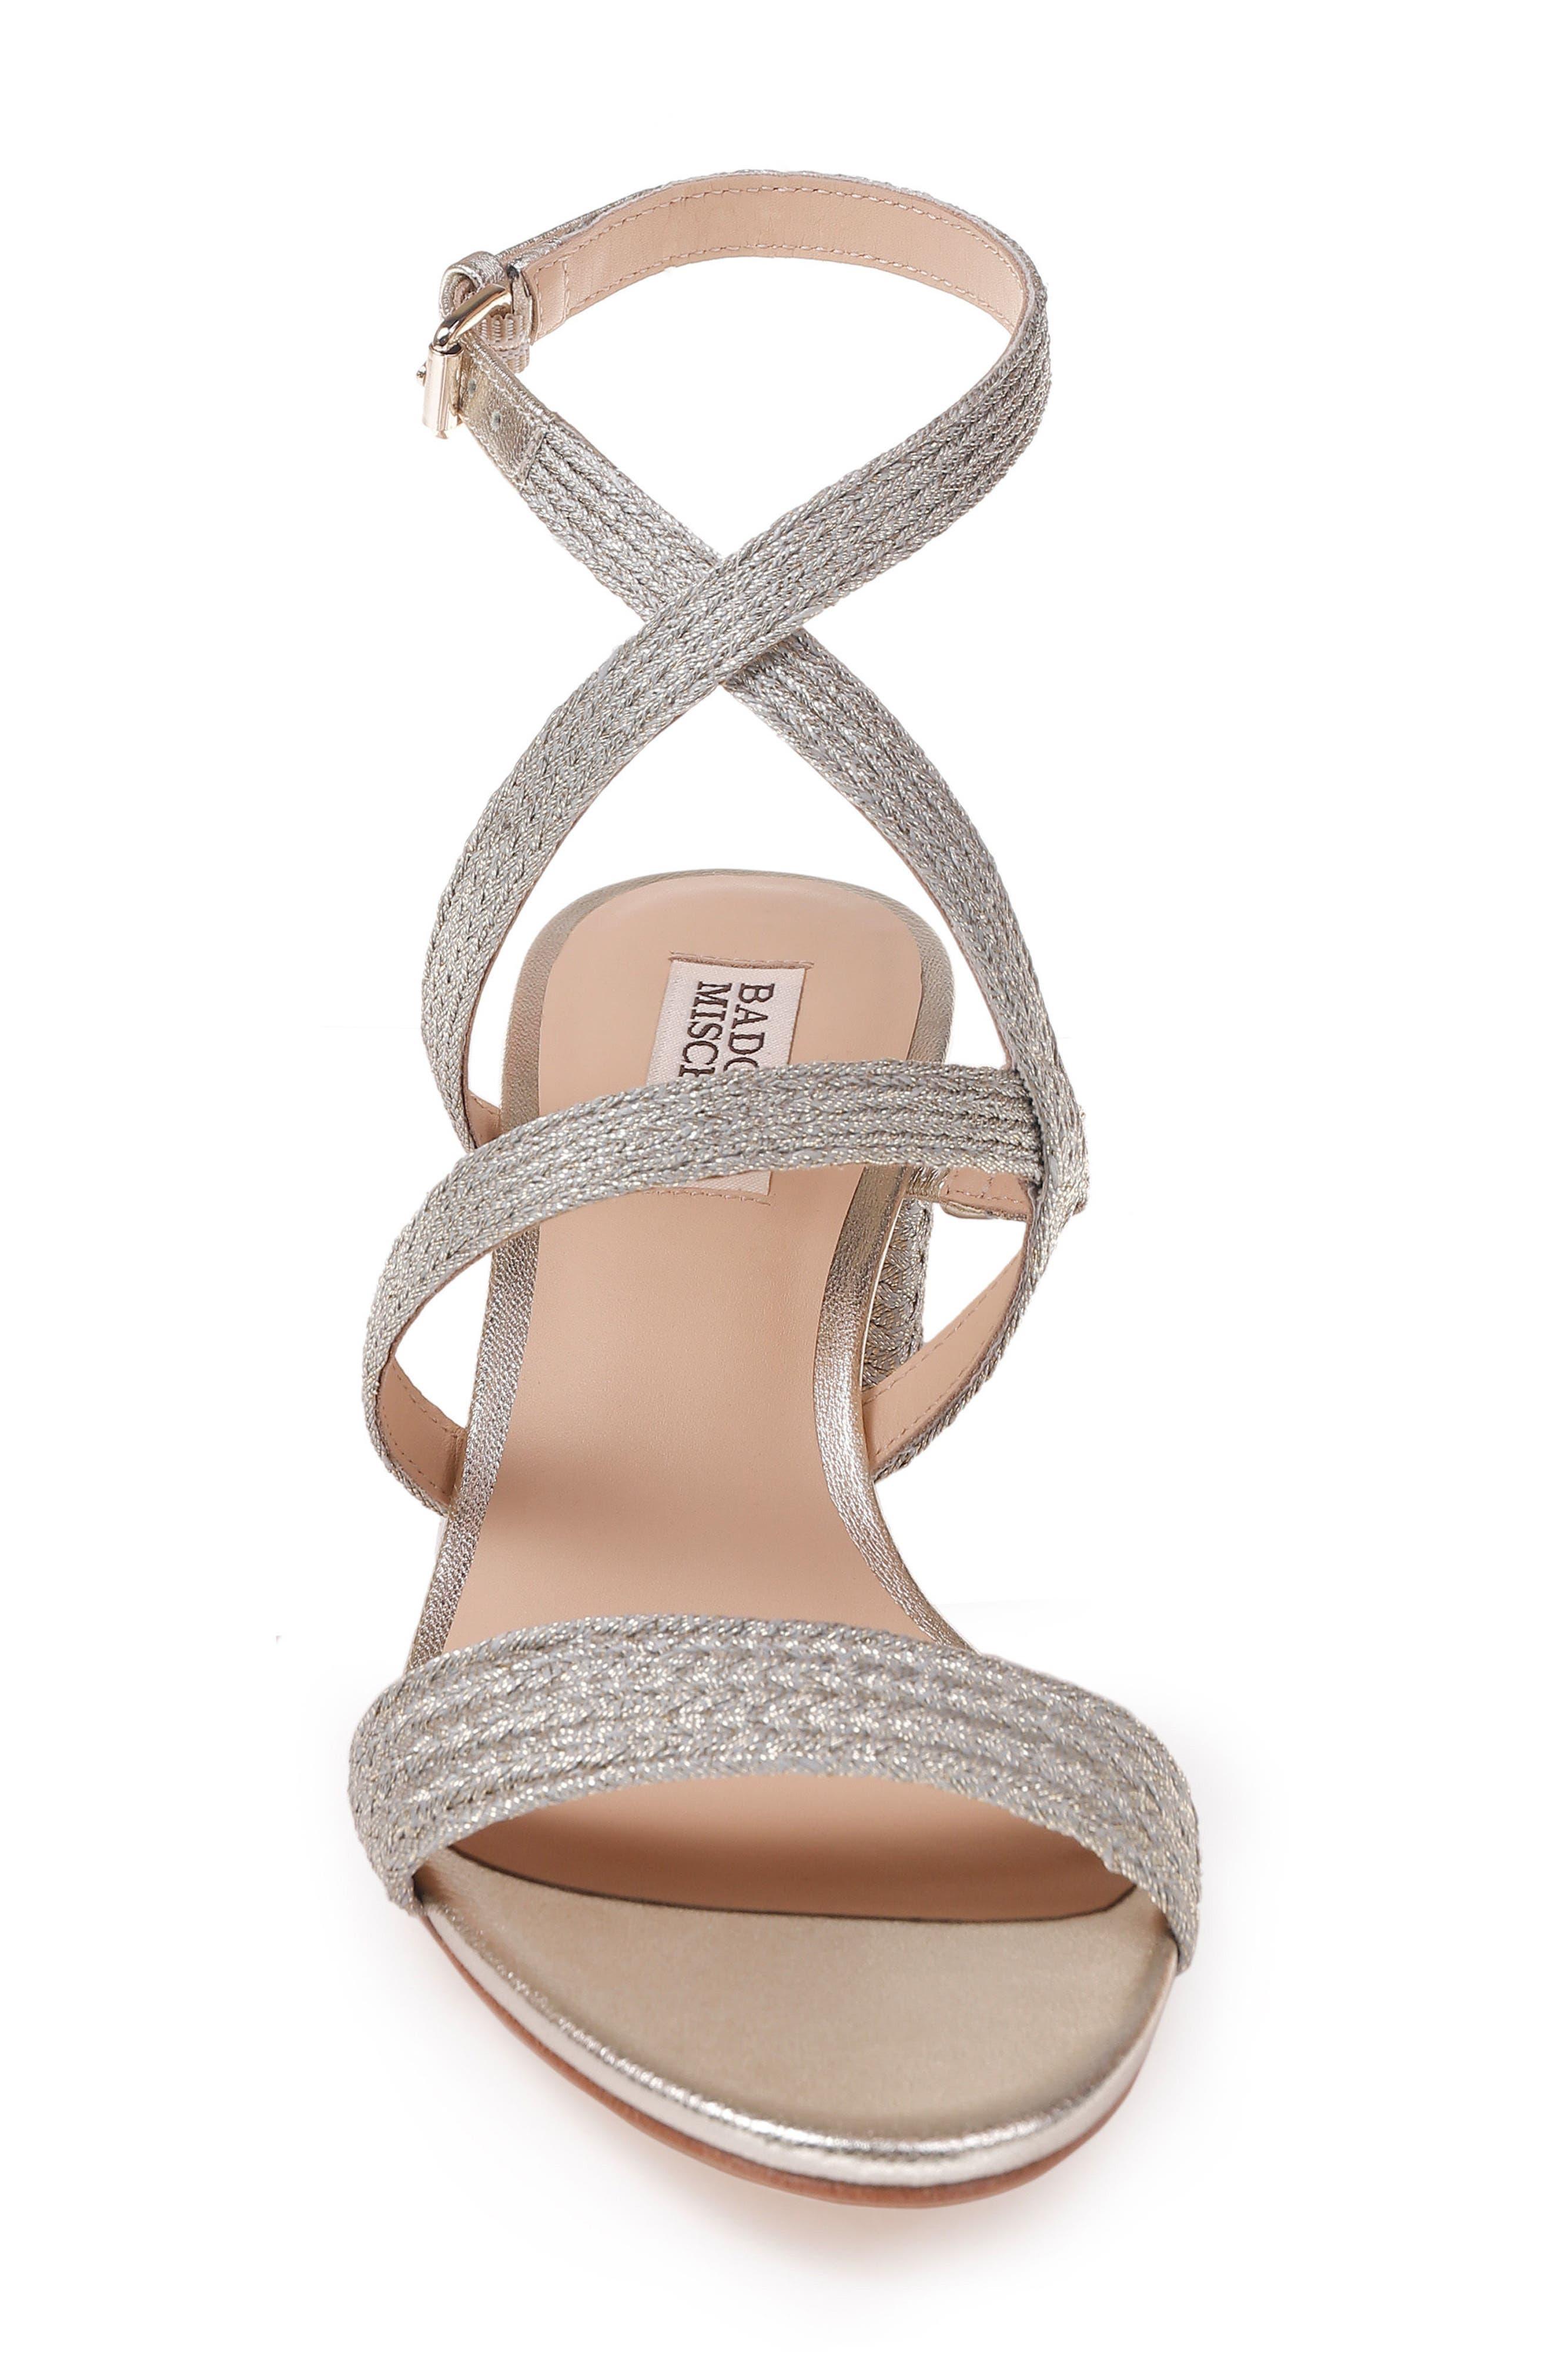 Storm Block Heel Sandal,                             Alternate thumbnail 4, color,                             PLATINO FABRIC